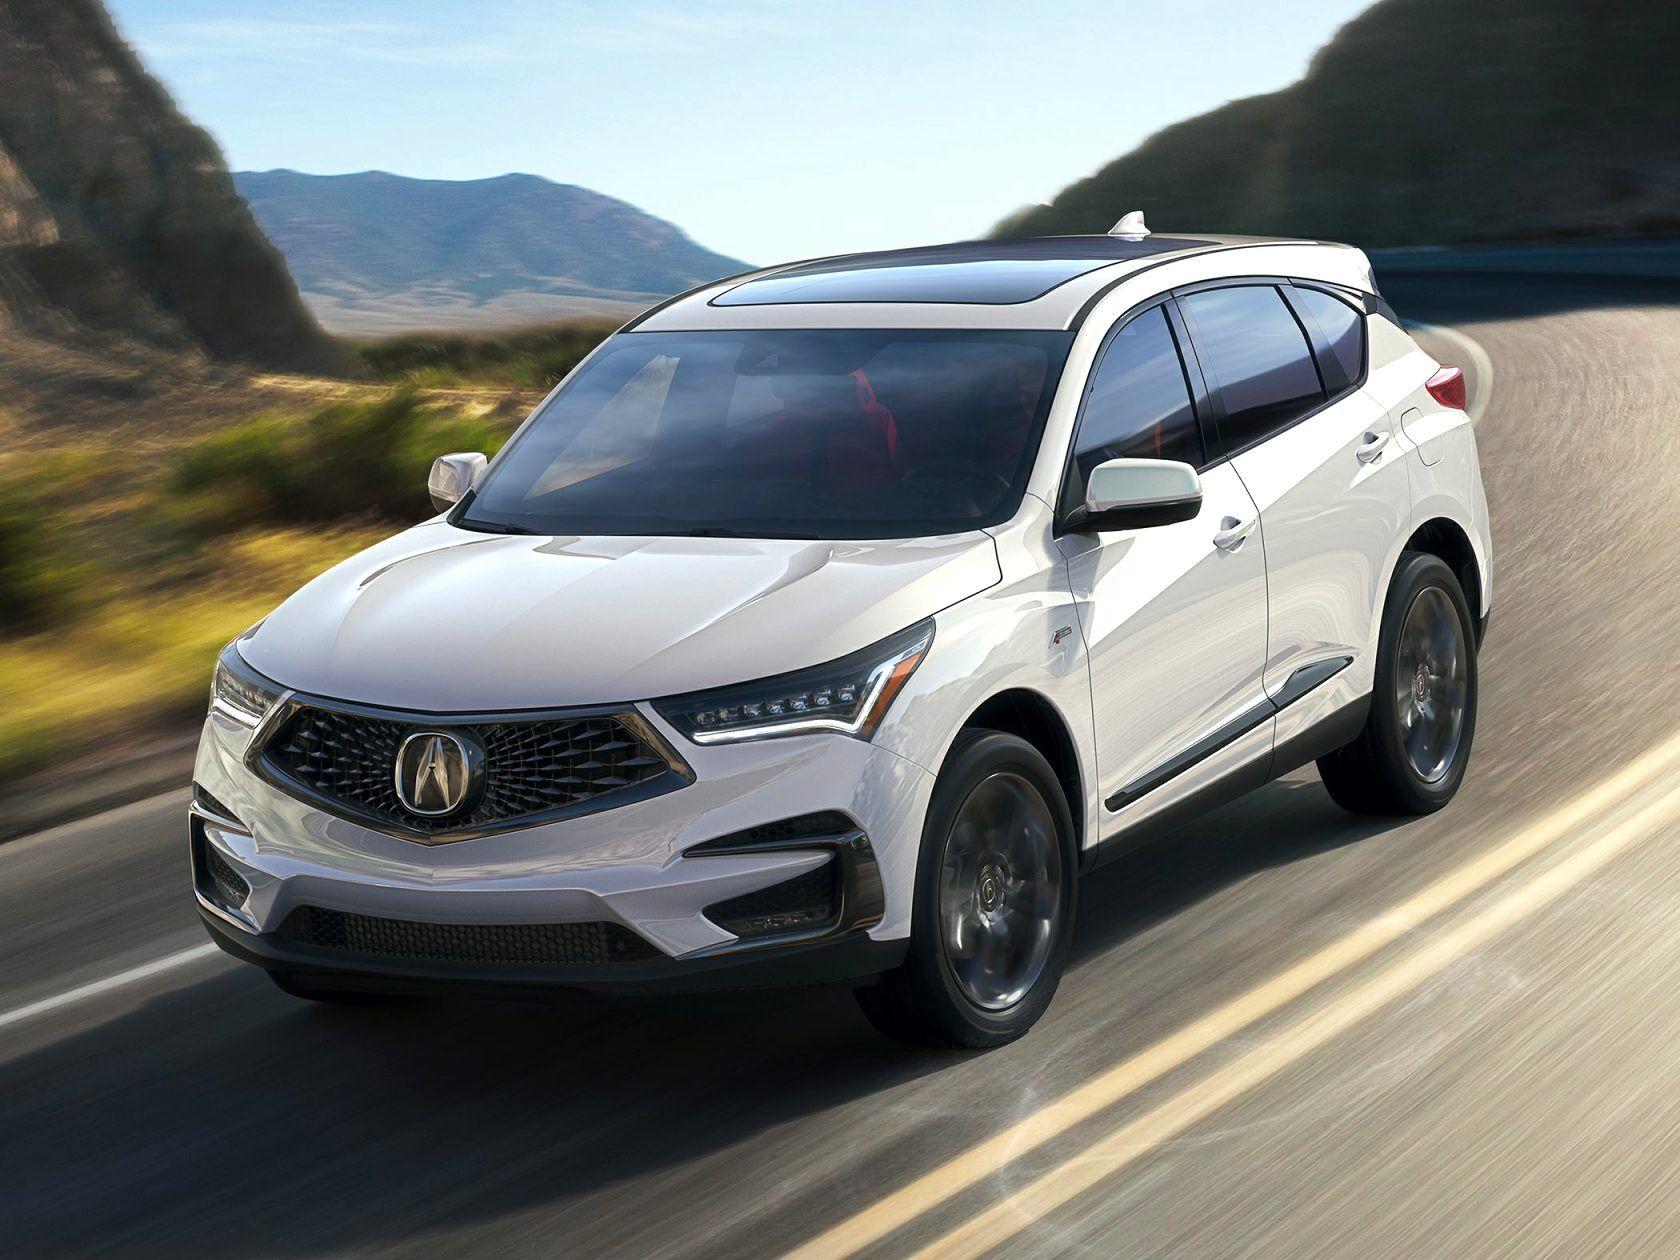 Invoice Price Of 2021 Acura Rdx Style In 2021 Acura Rdx Acura Hybrid Car